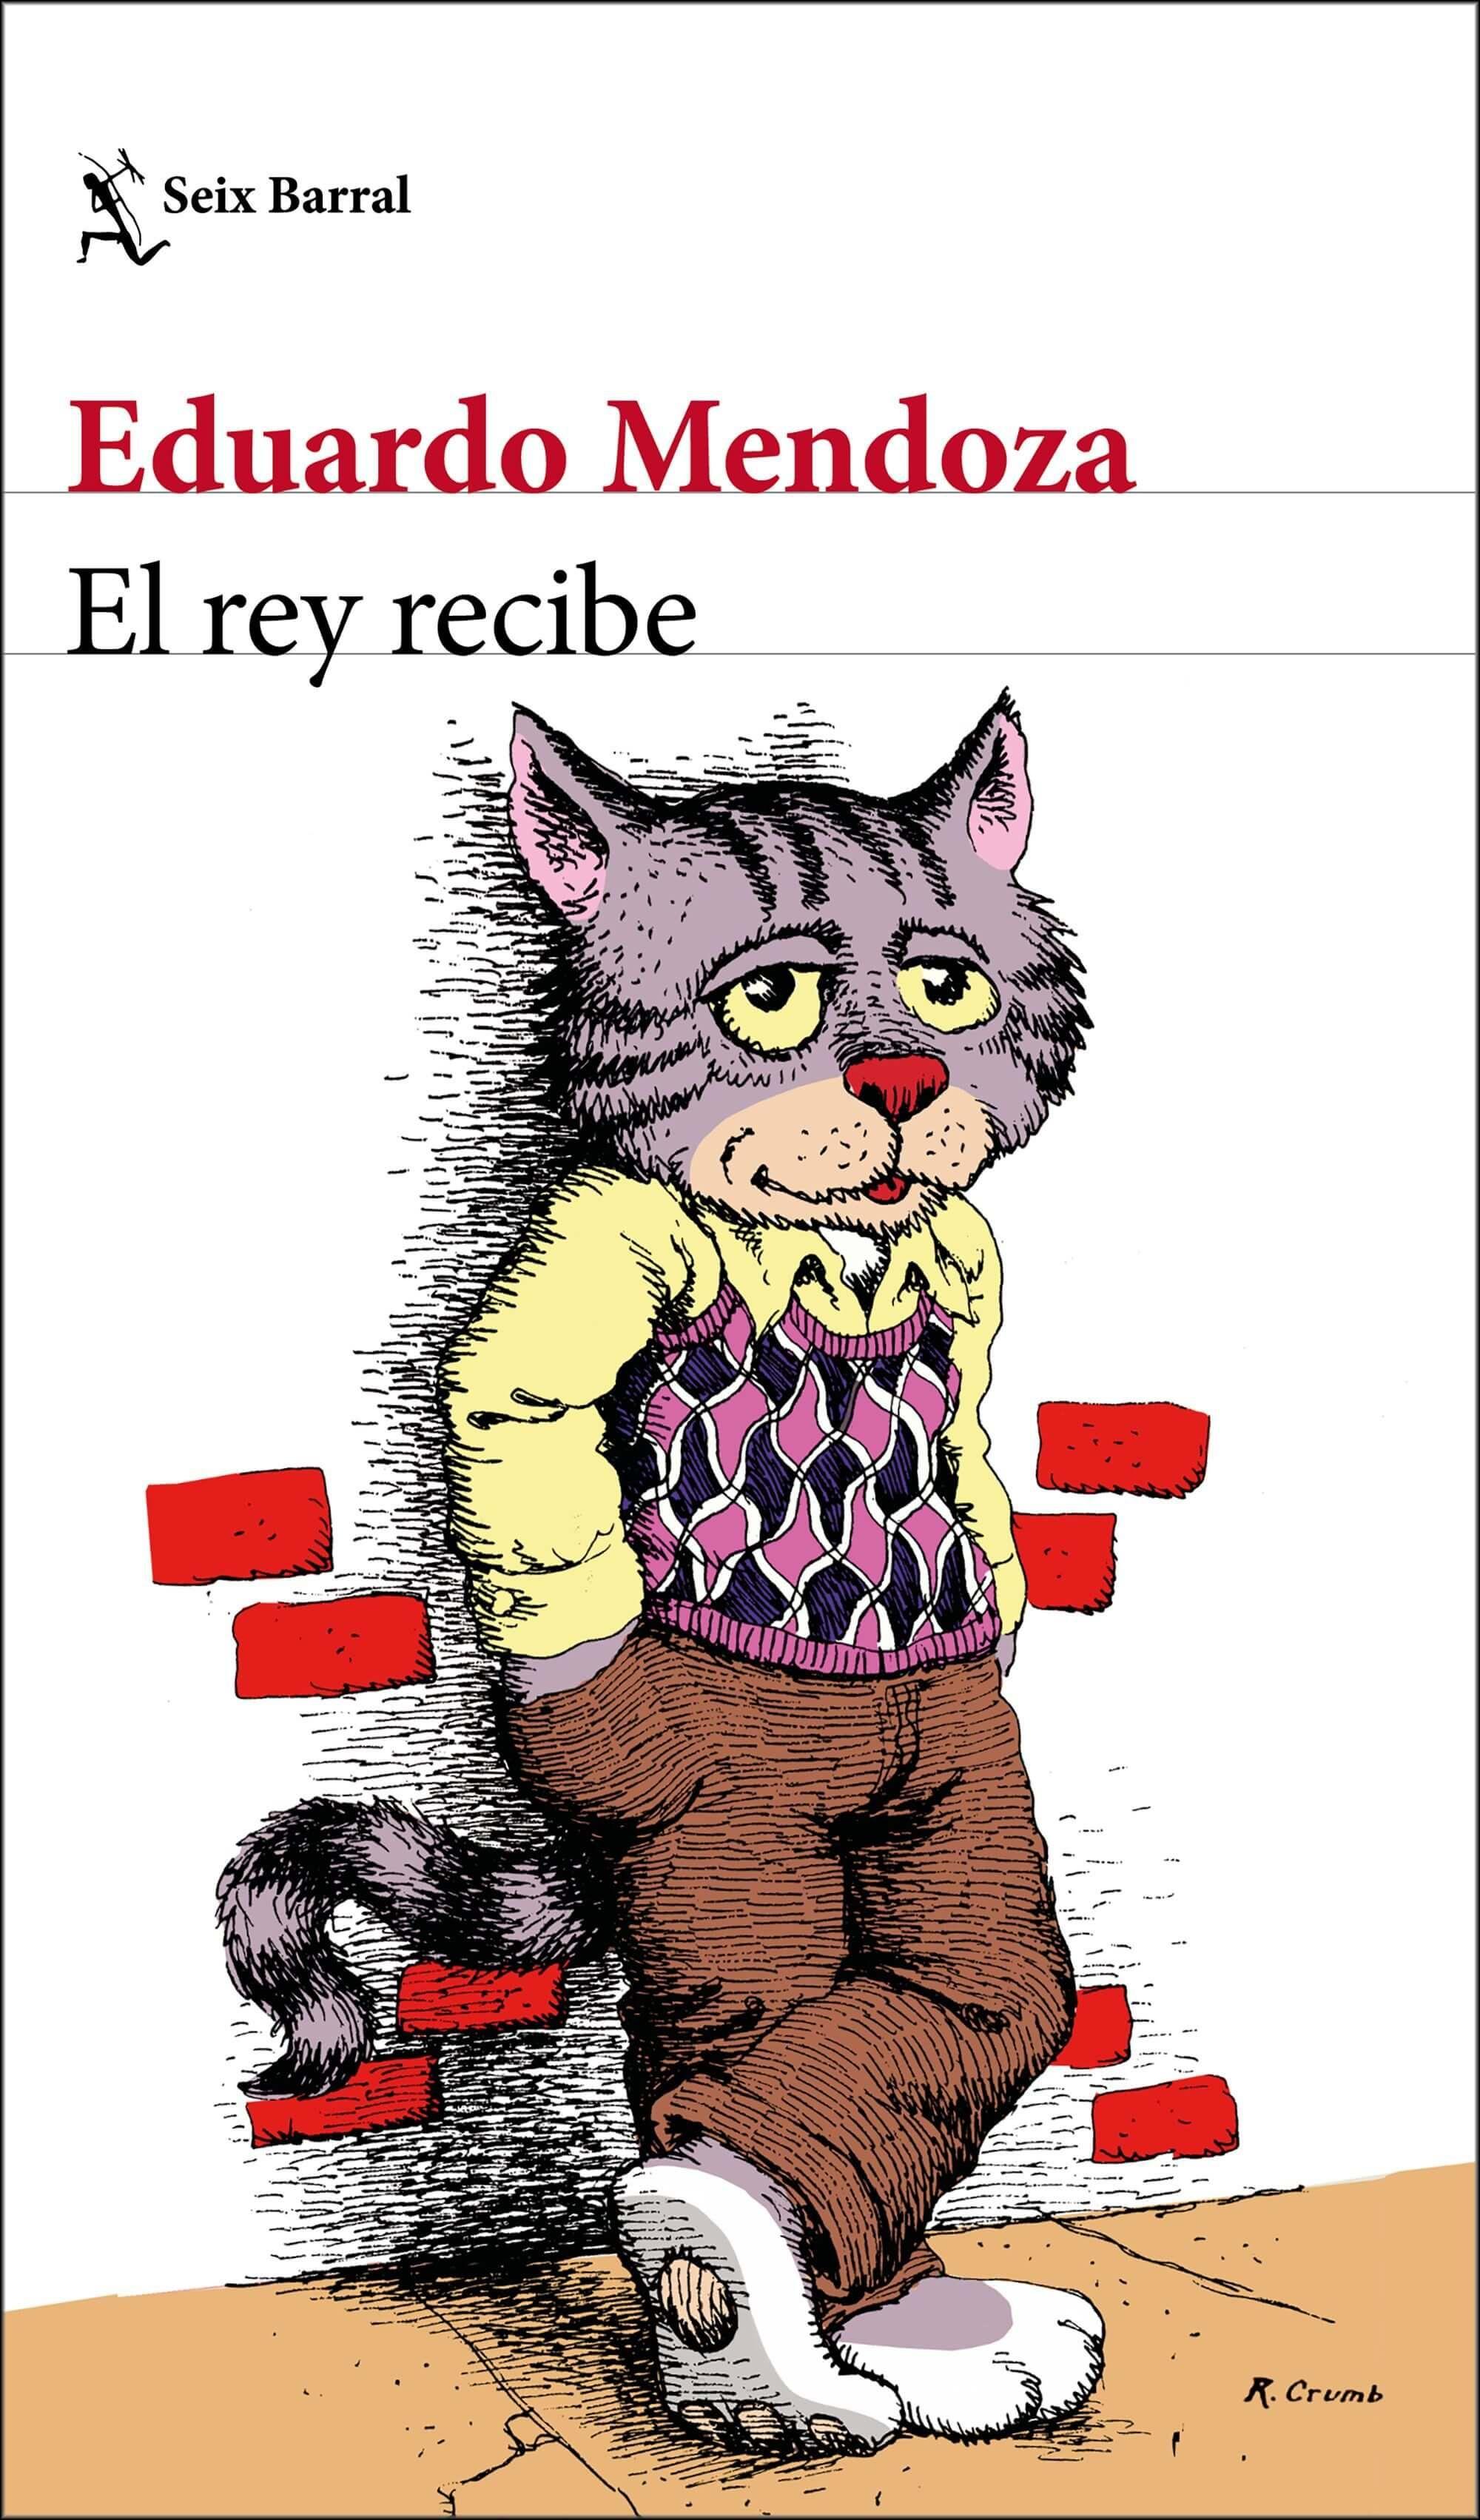 El rey recibe - PDF & ePUB | Book EPUB PDF en 2018 | Pinterest